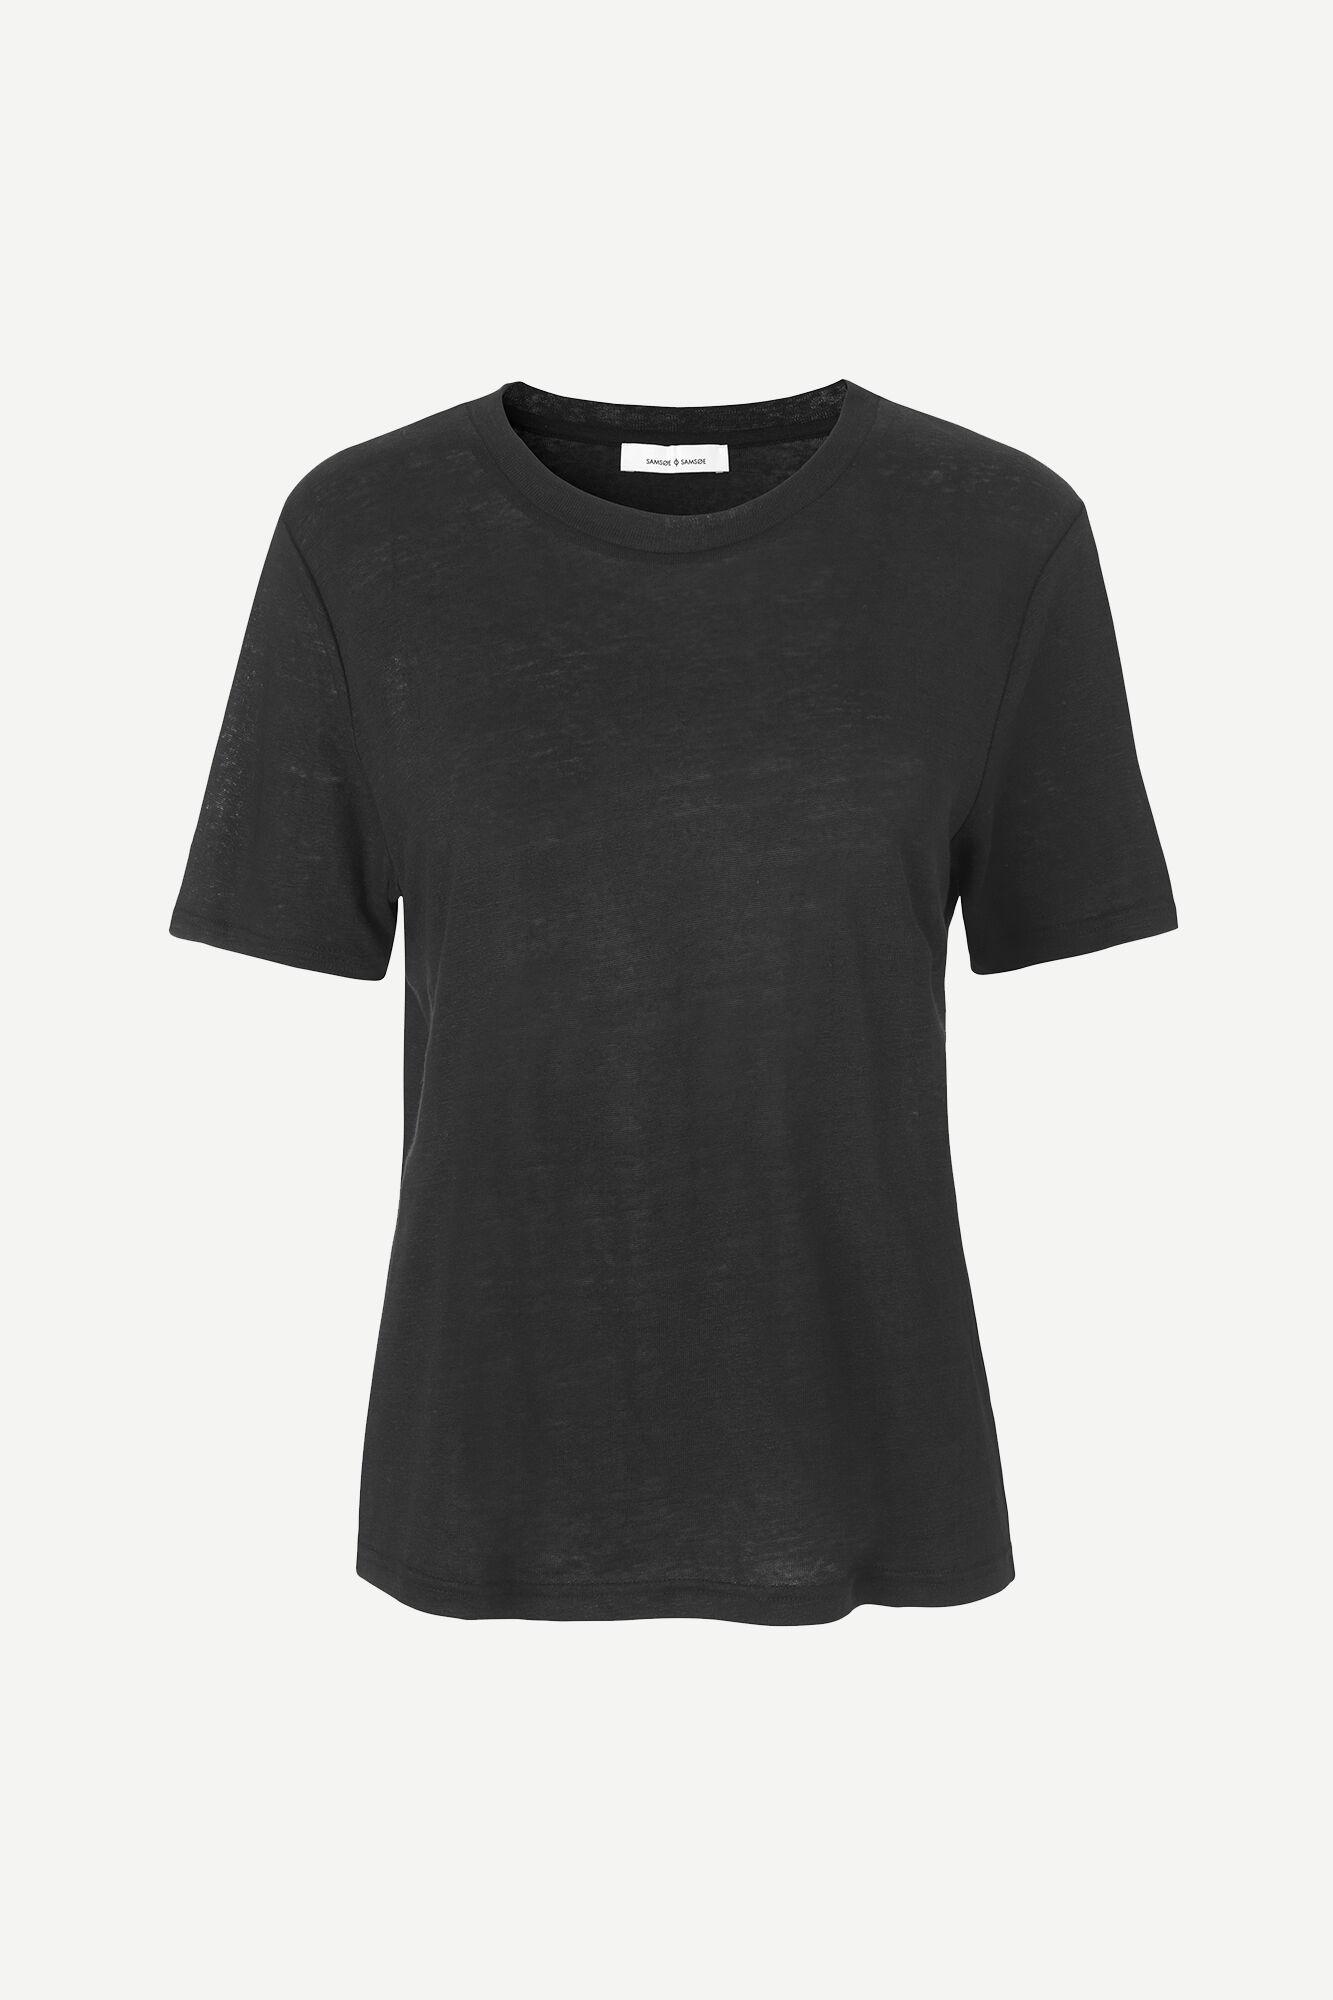 SAMSOE t-shirt agnes-1